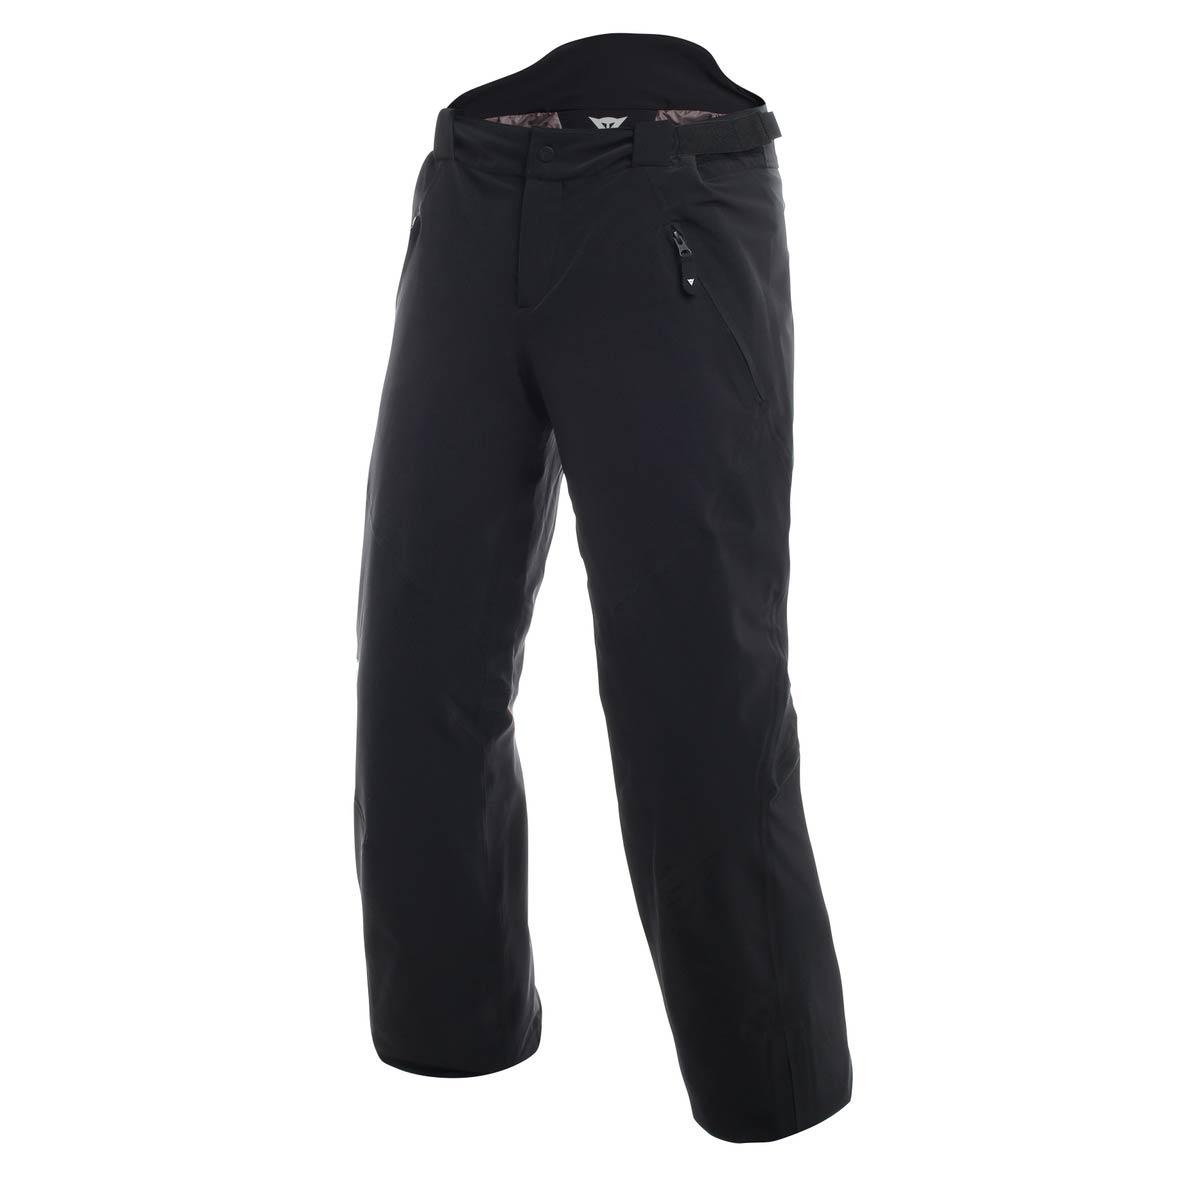 Dainese Outerwear Hose HP2 P M1